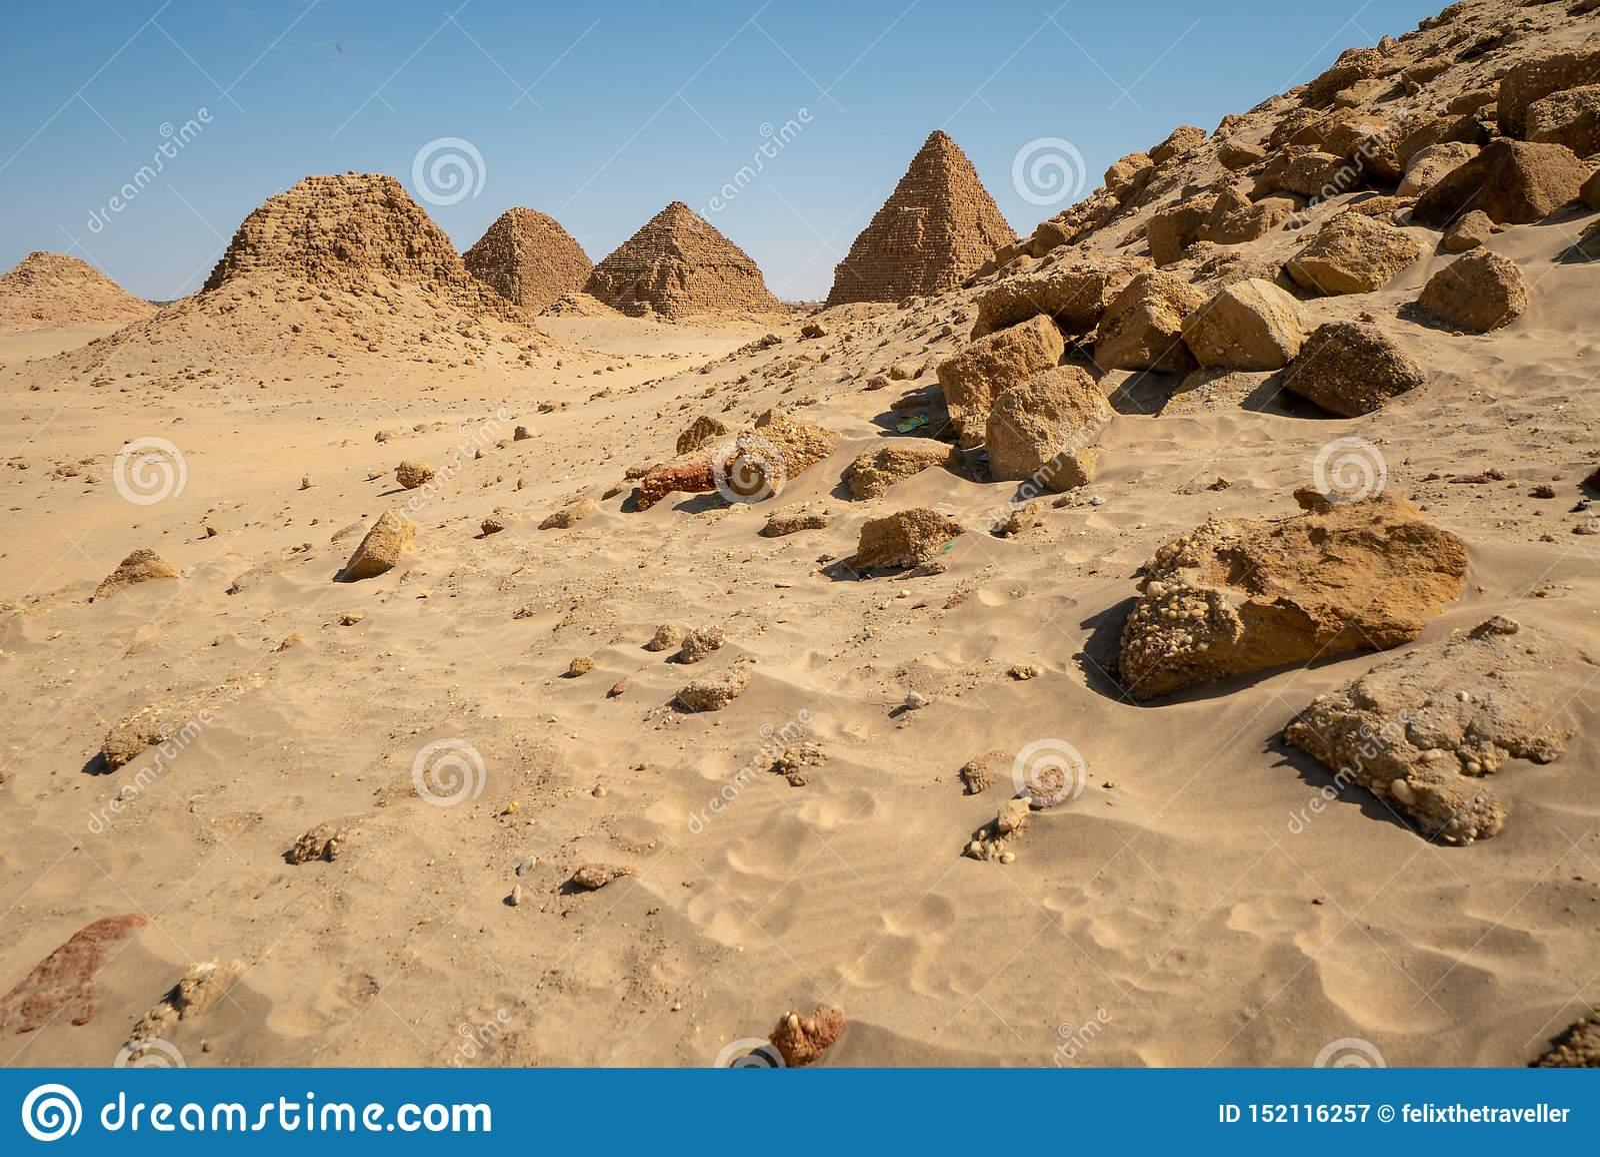 Nubian Pyramids in the Sudan - Nuri